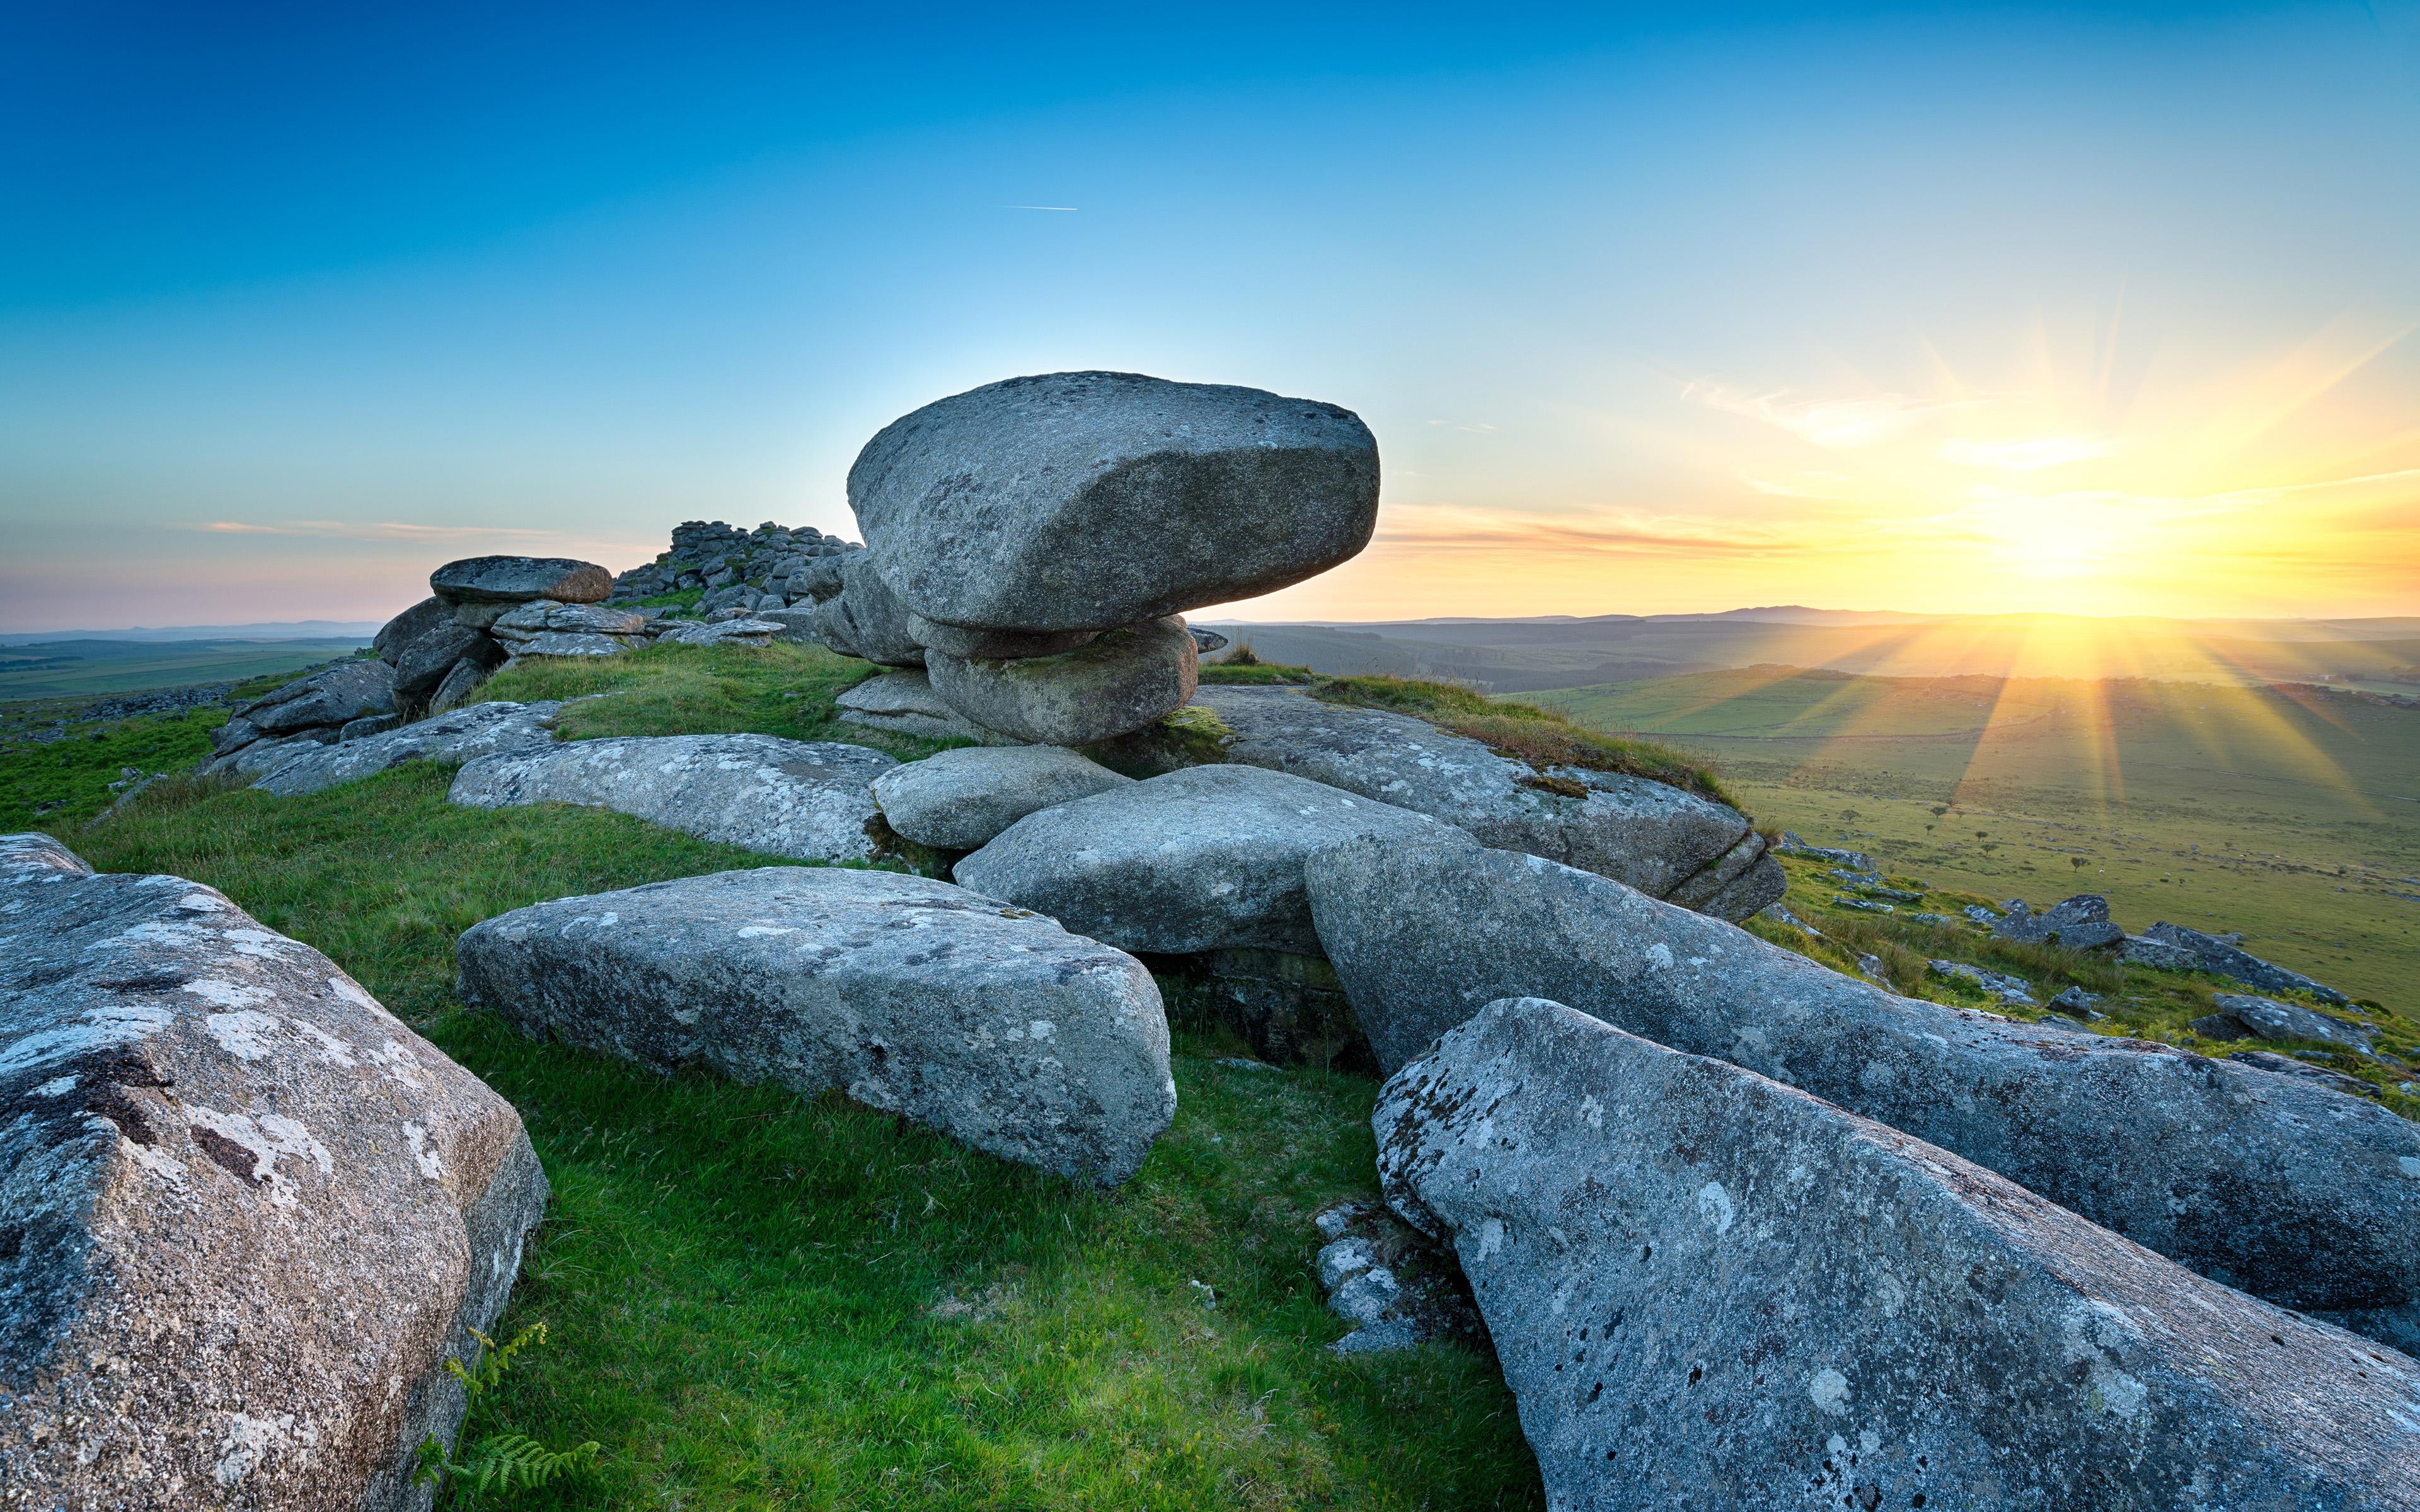 пейзажи на камнях фото наводит светлые